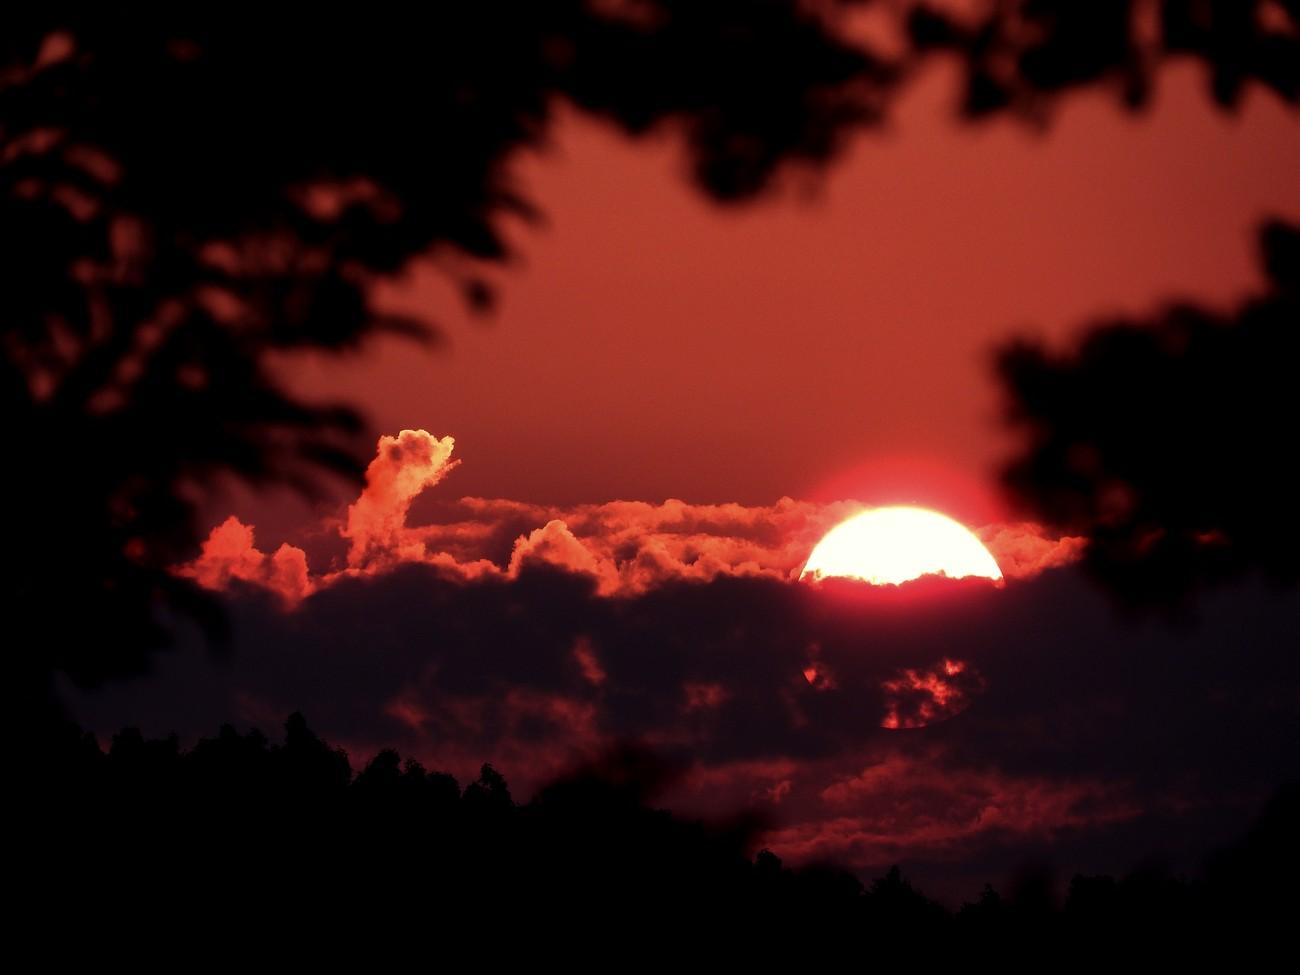 last shot as sun rose above the cloudy horizon